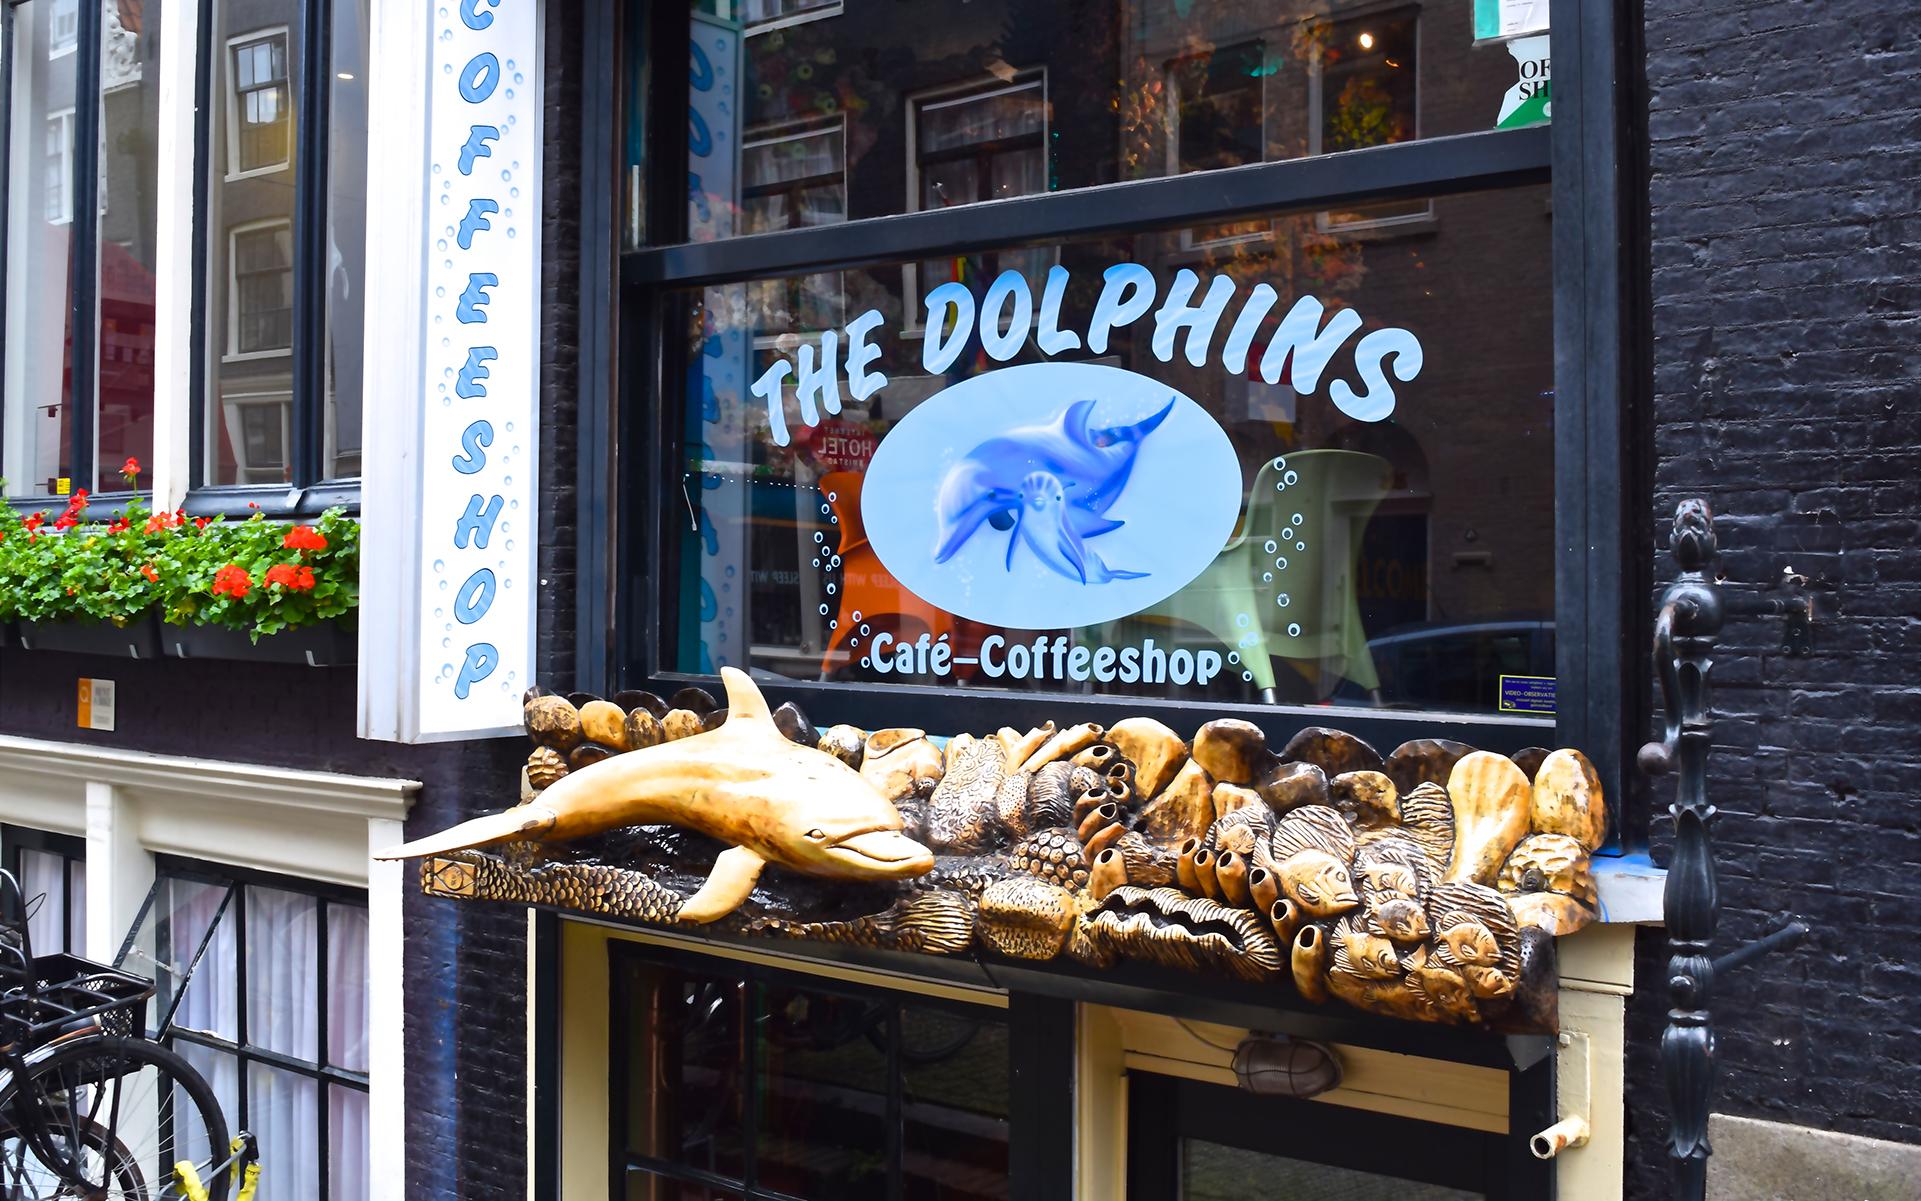 Amsterdam Cannabis Coffeeshop: The Dolphins